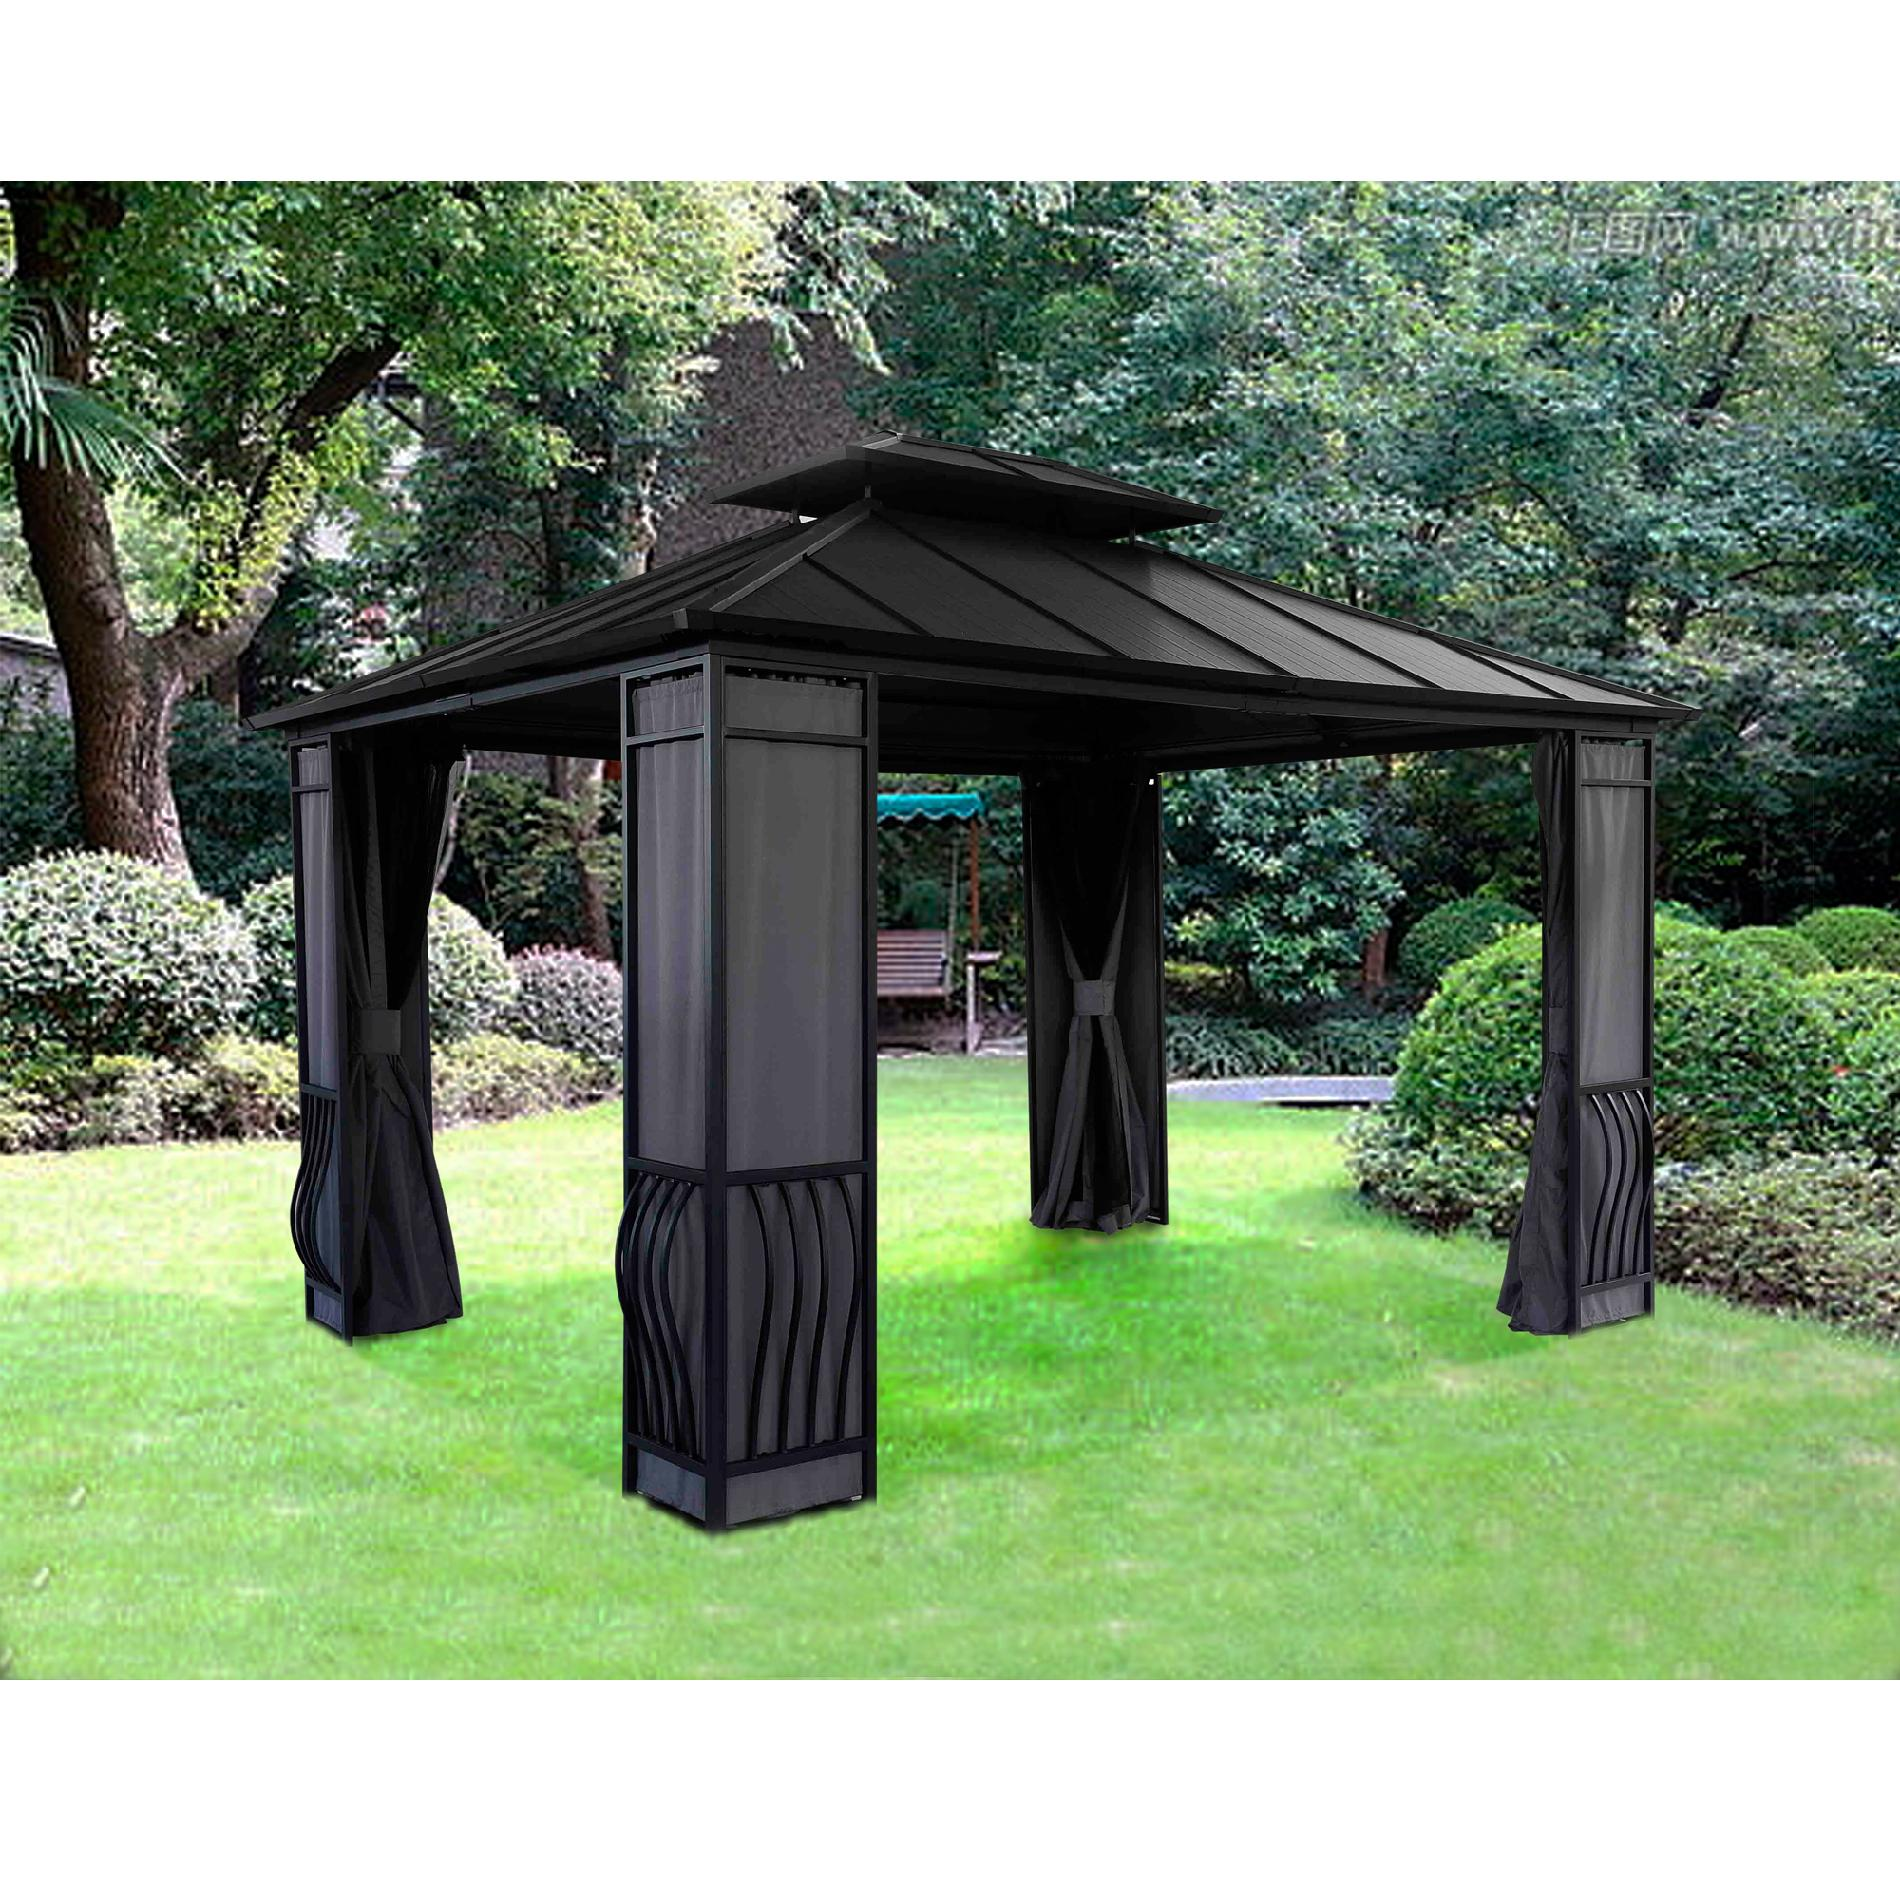 academy sports patio chairs pedrali queen chair 22 cool outdoor canopies at kmart pixelmari